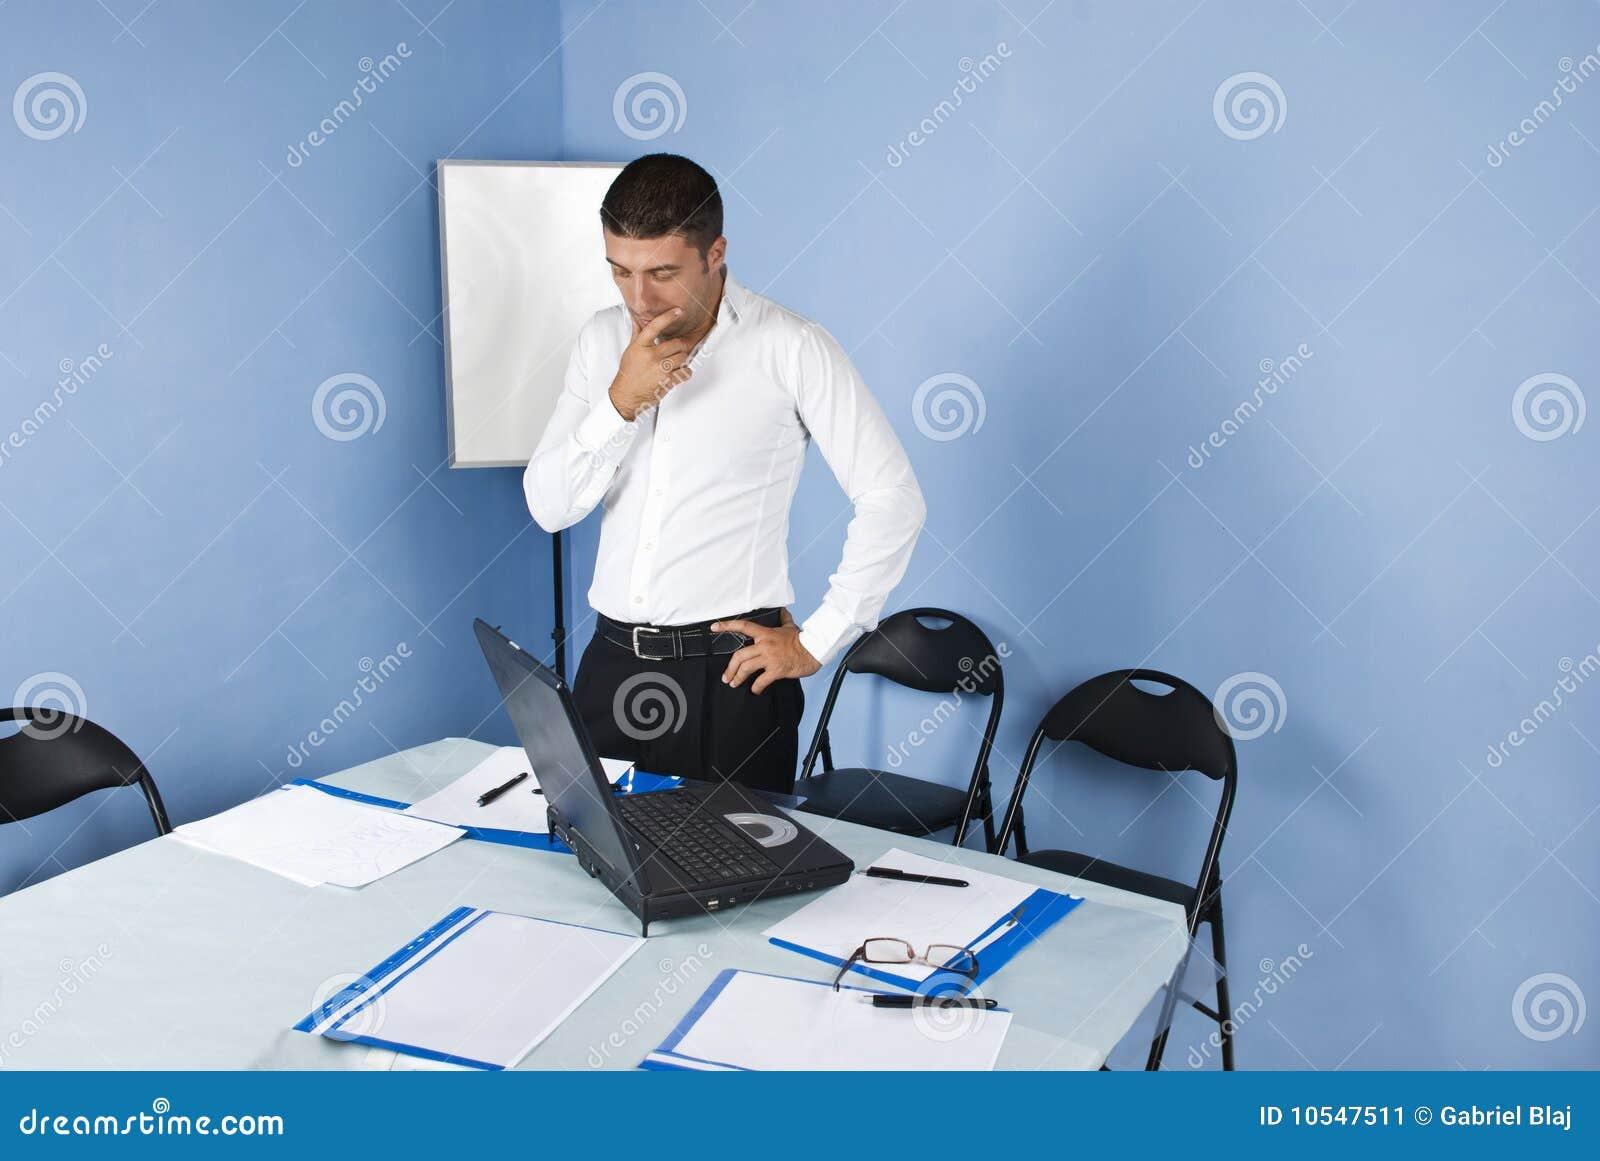 Hombre de negocios pensativo en sala de reunión